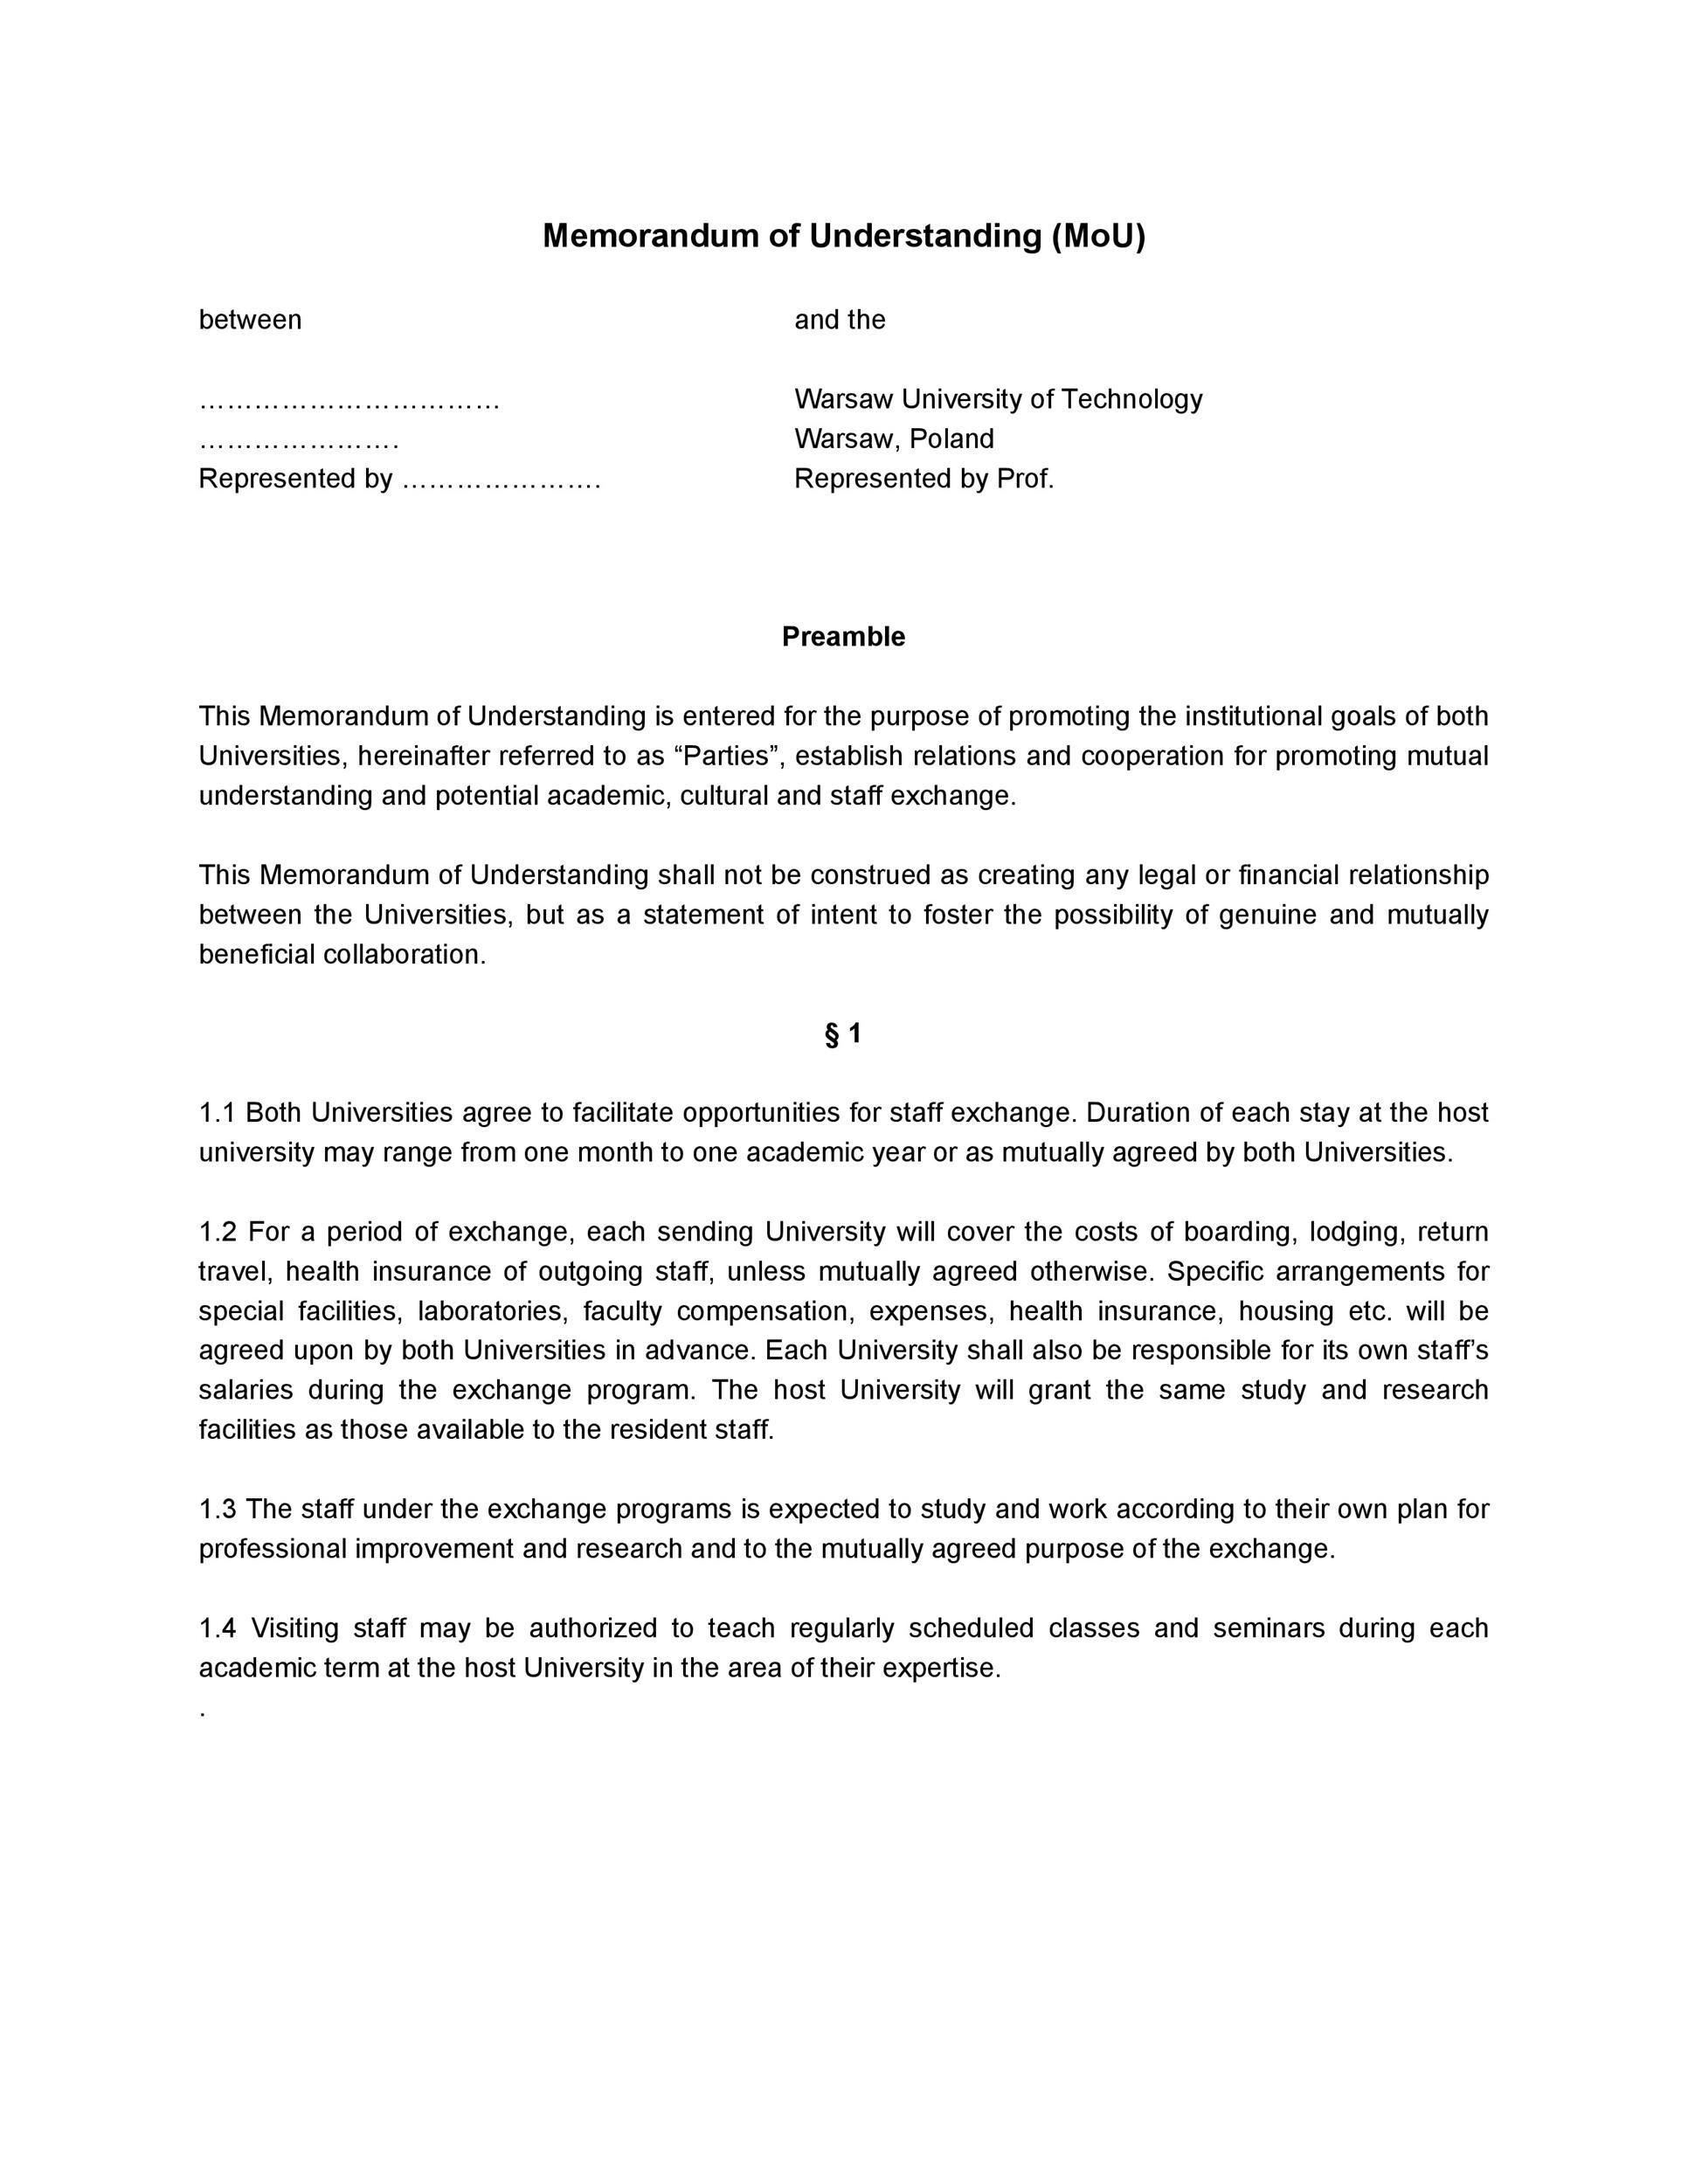 Free Memorandum of Understanding Template 37